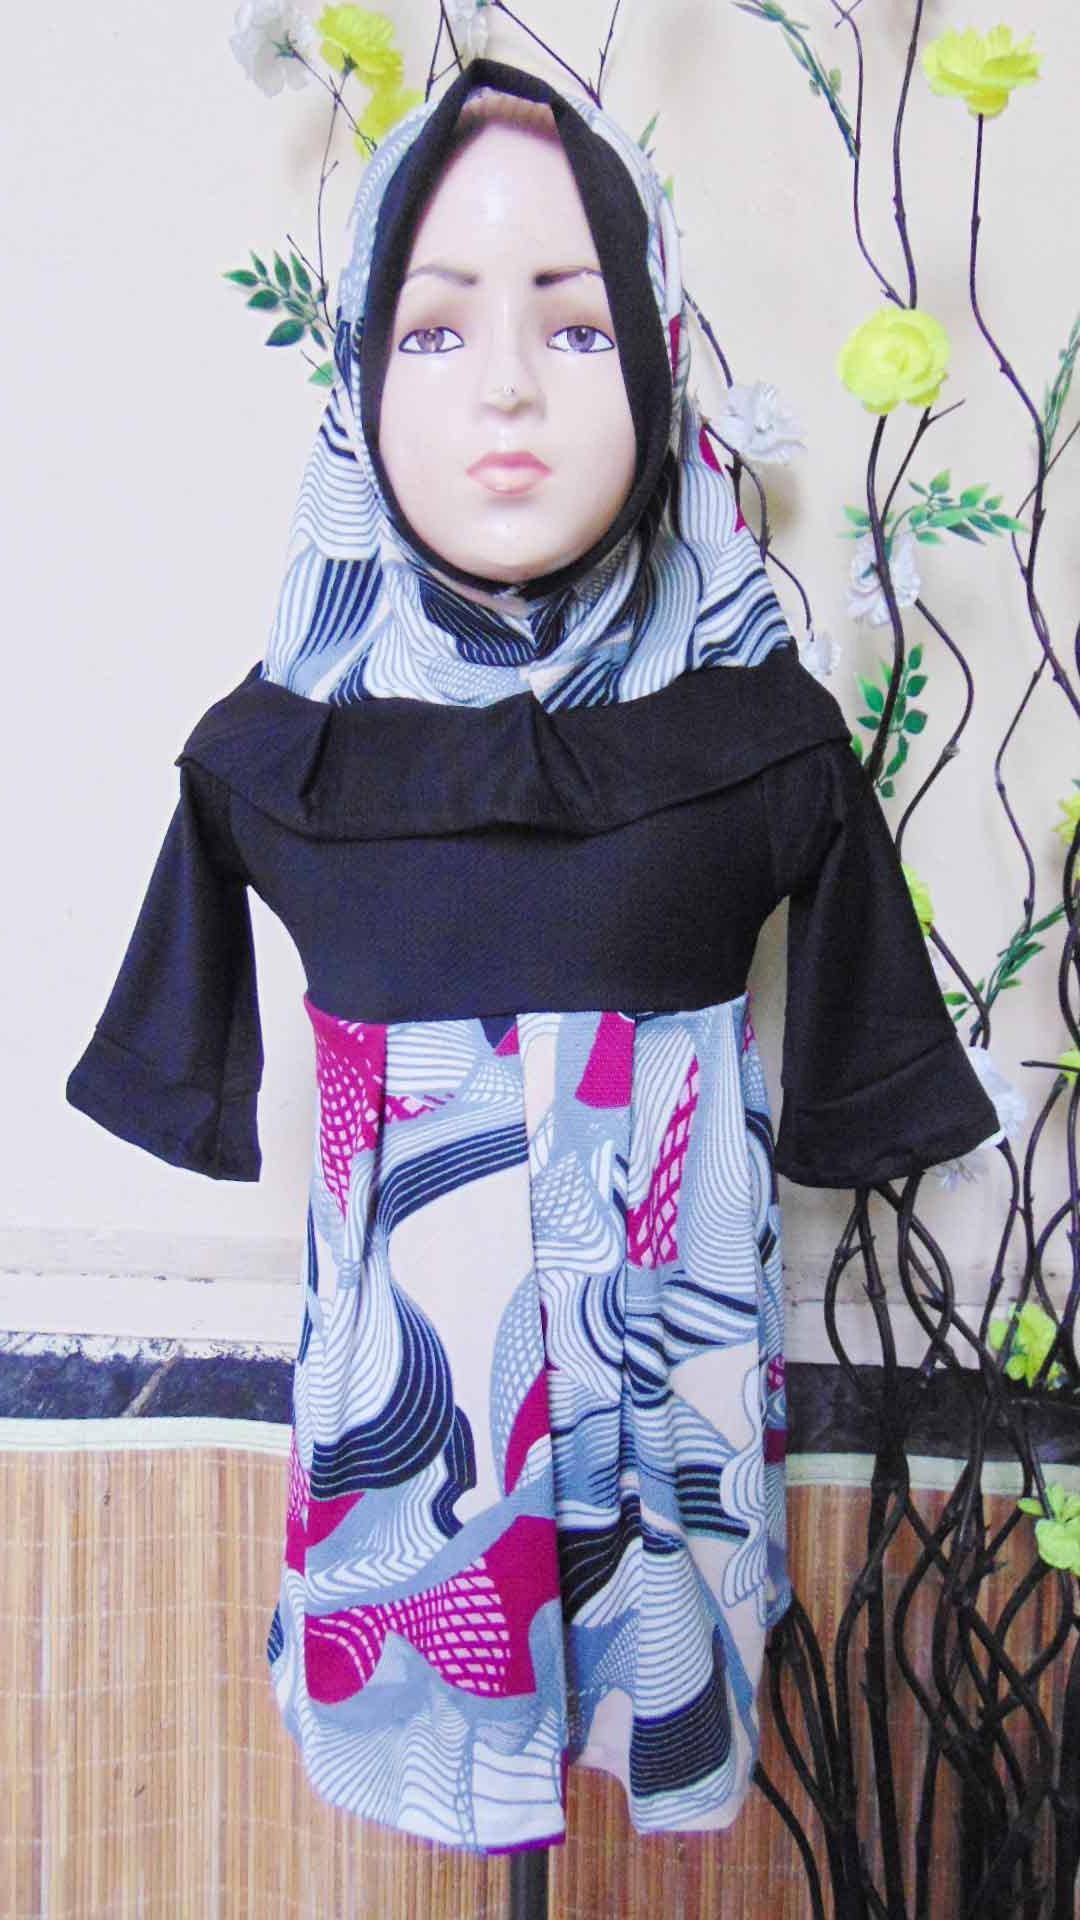 PALING MURAH Baju Muslim Gamis Aisyah Anak Bayi Perempuan 6-18bulan Plus Hijab Abstrak cantik 44 Lebar Dada 27cm, Panjang 49cm